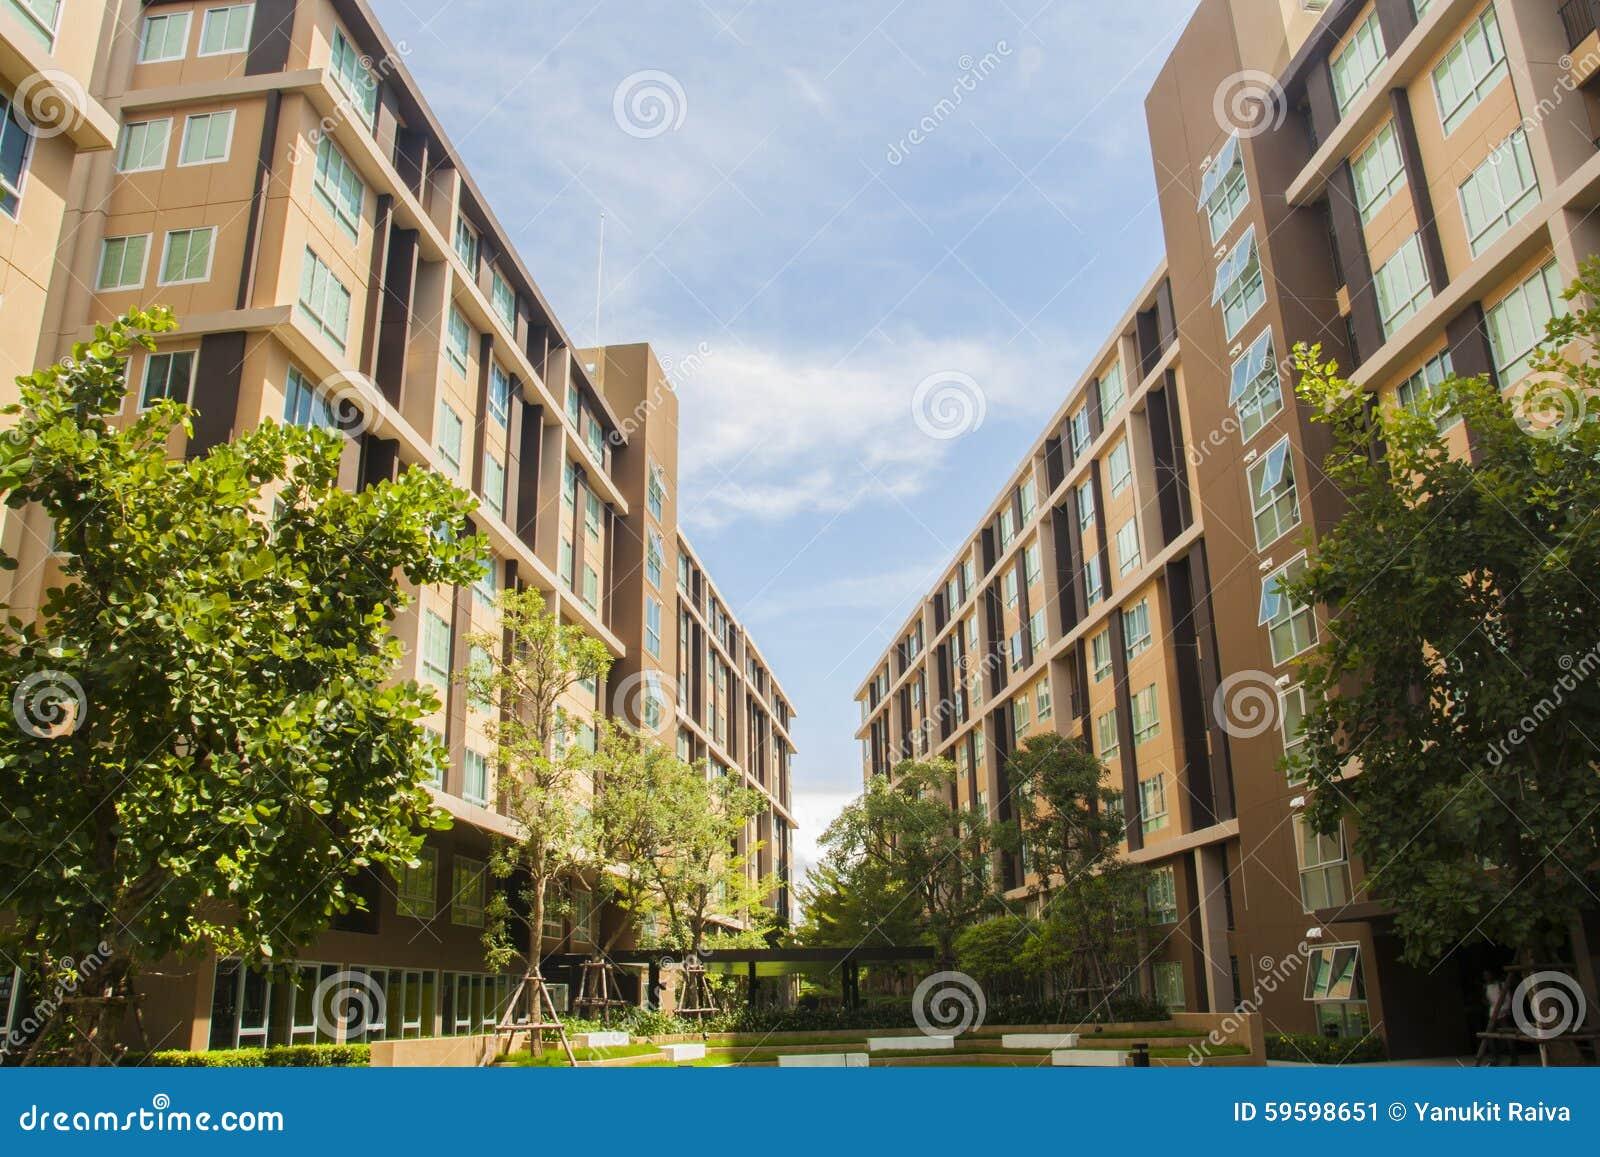 dormitory building perspective